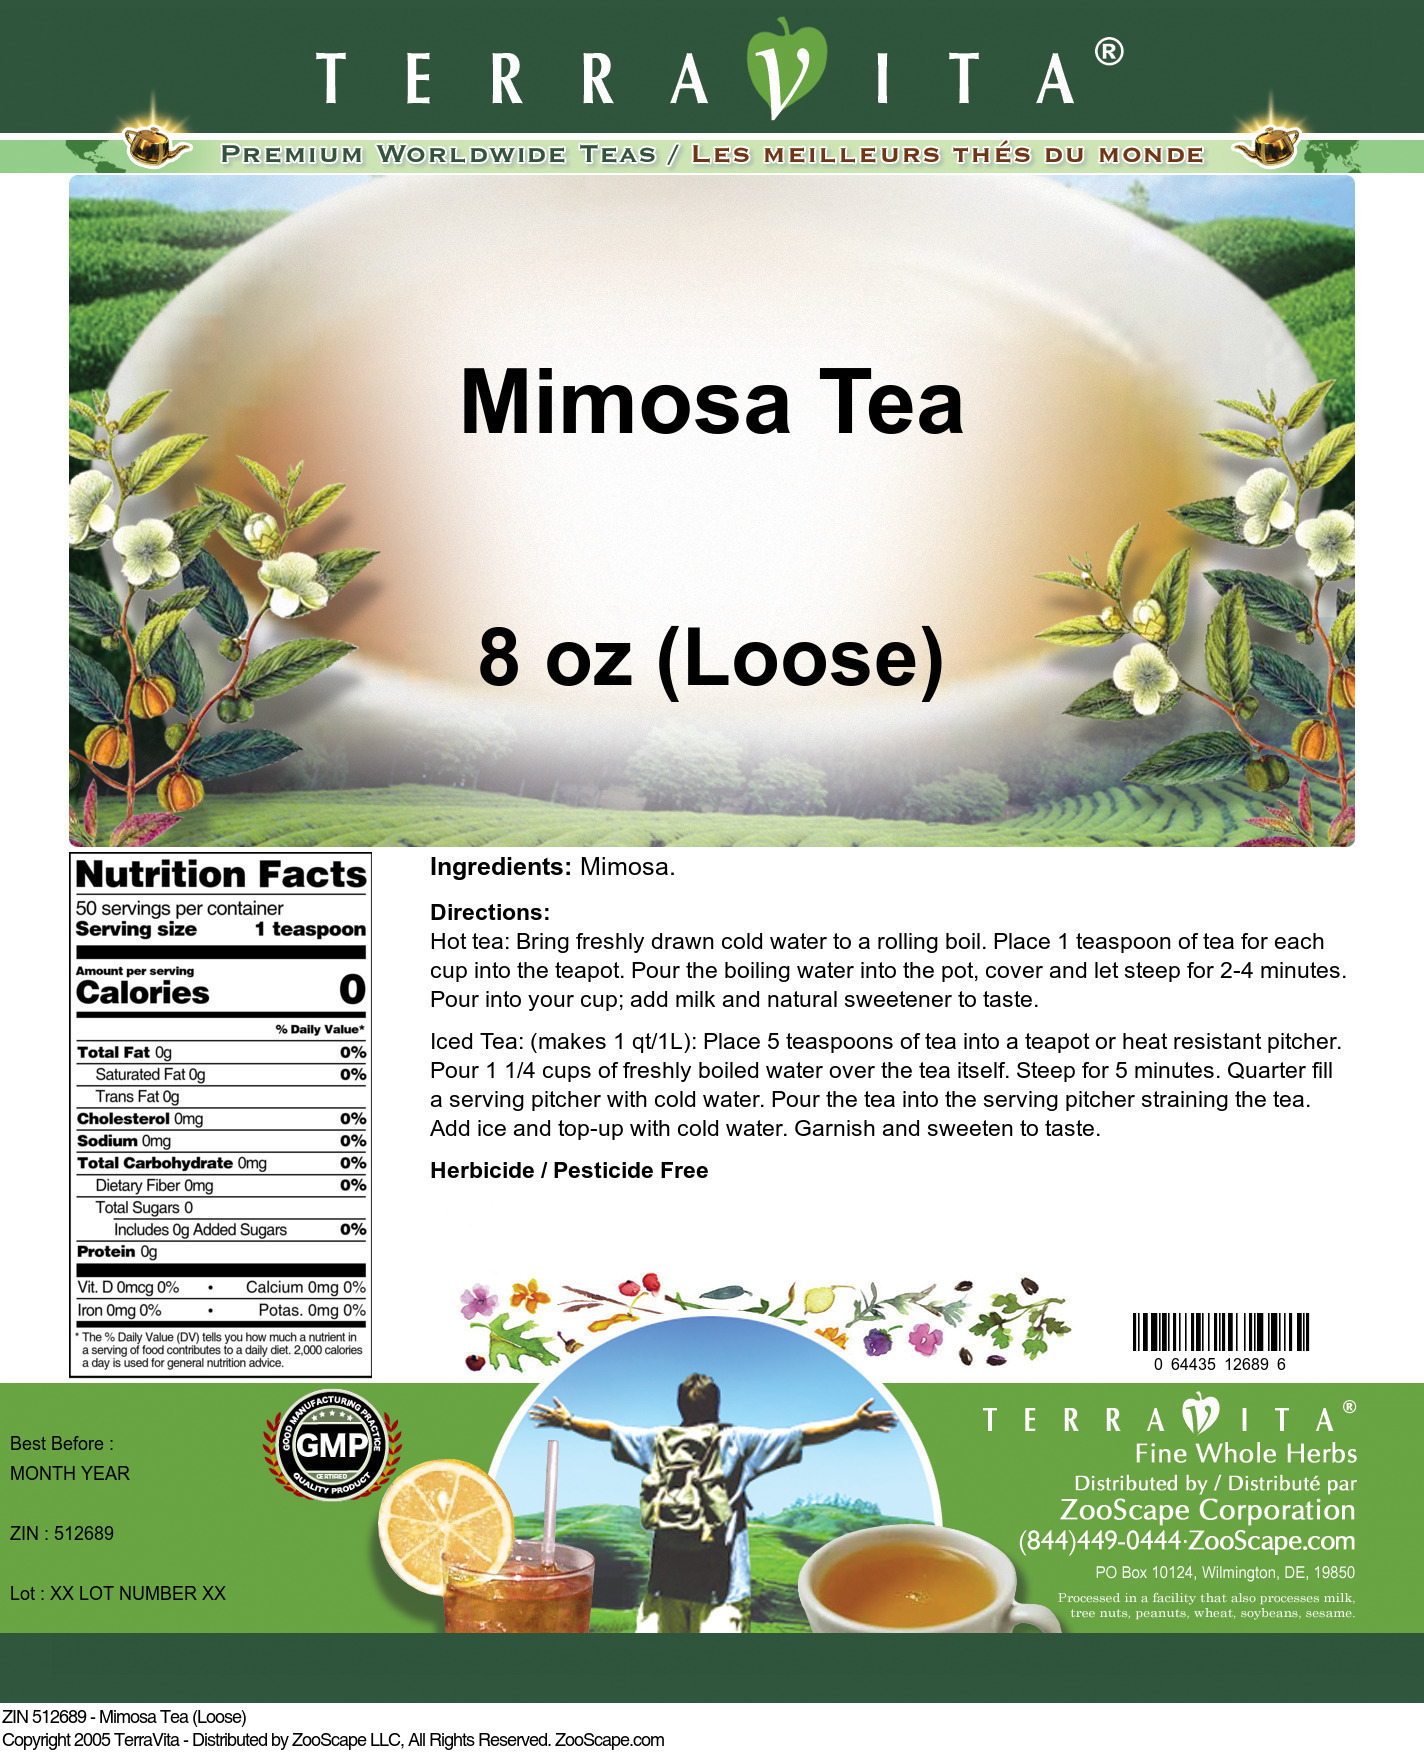 Mimosa Tea (Loose)